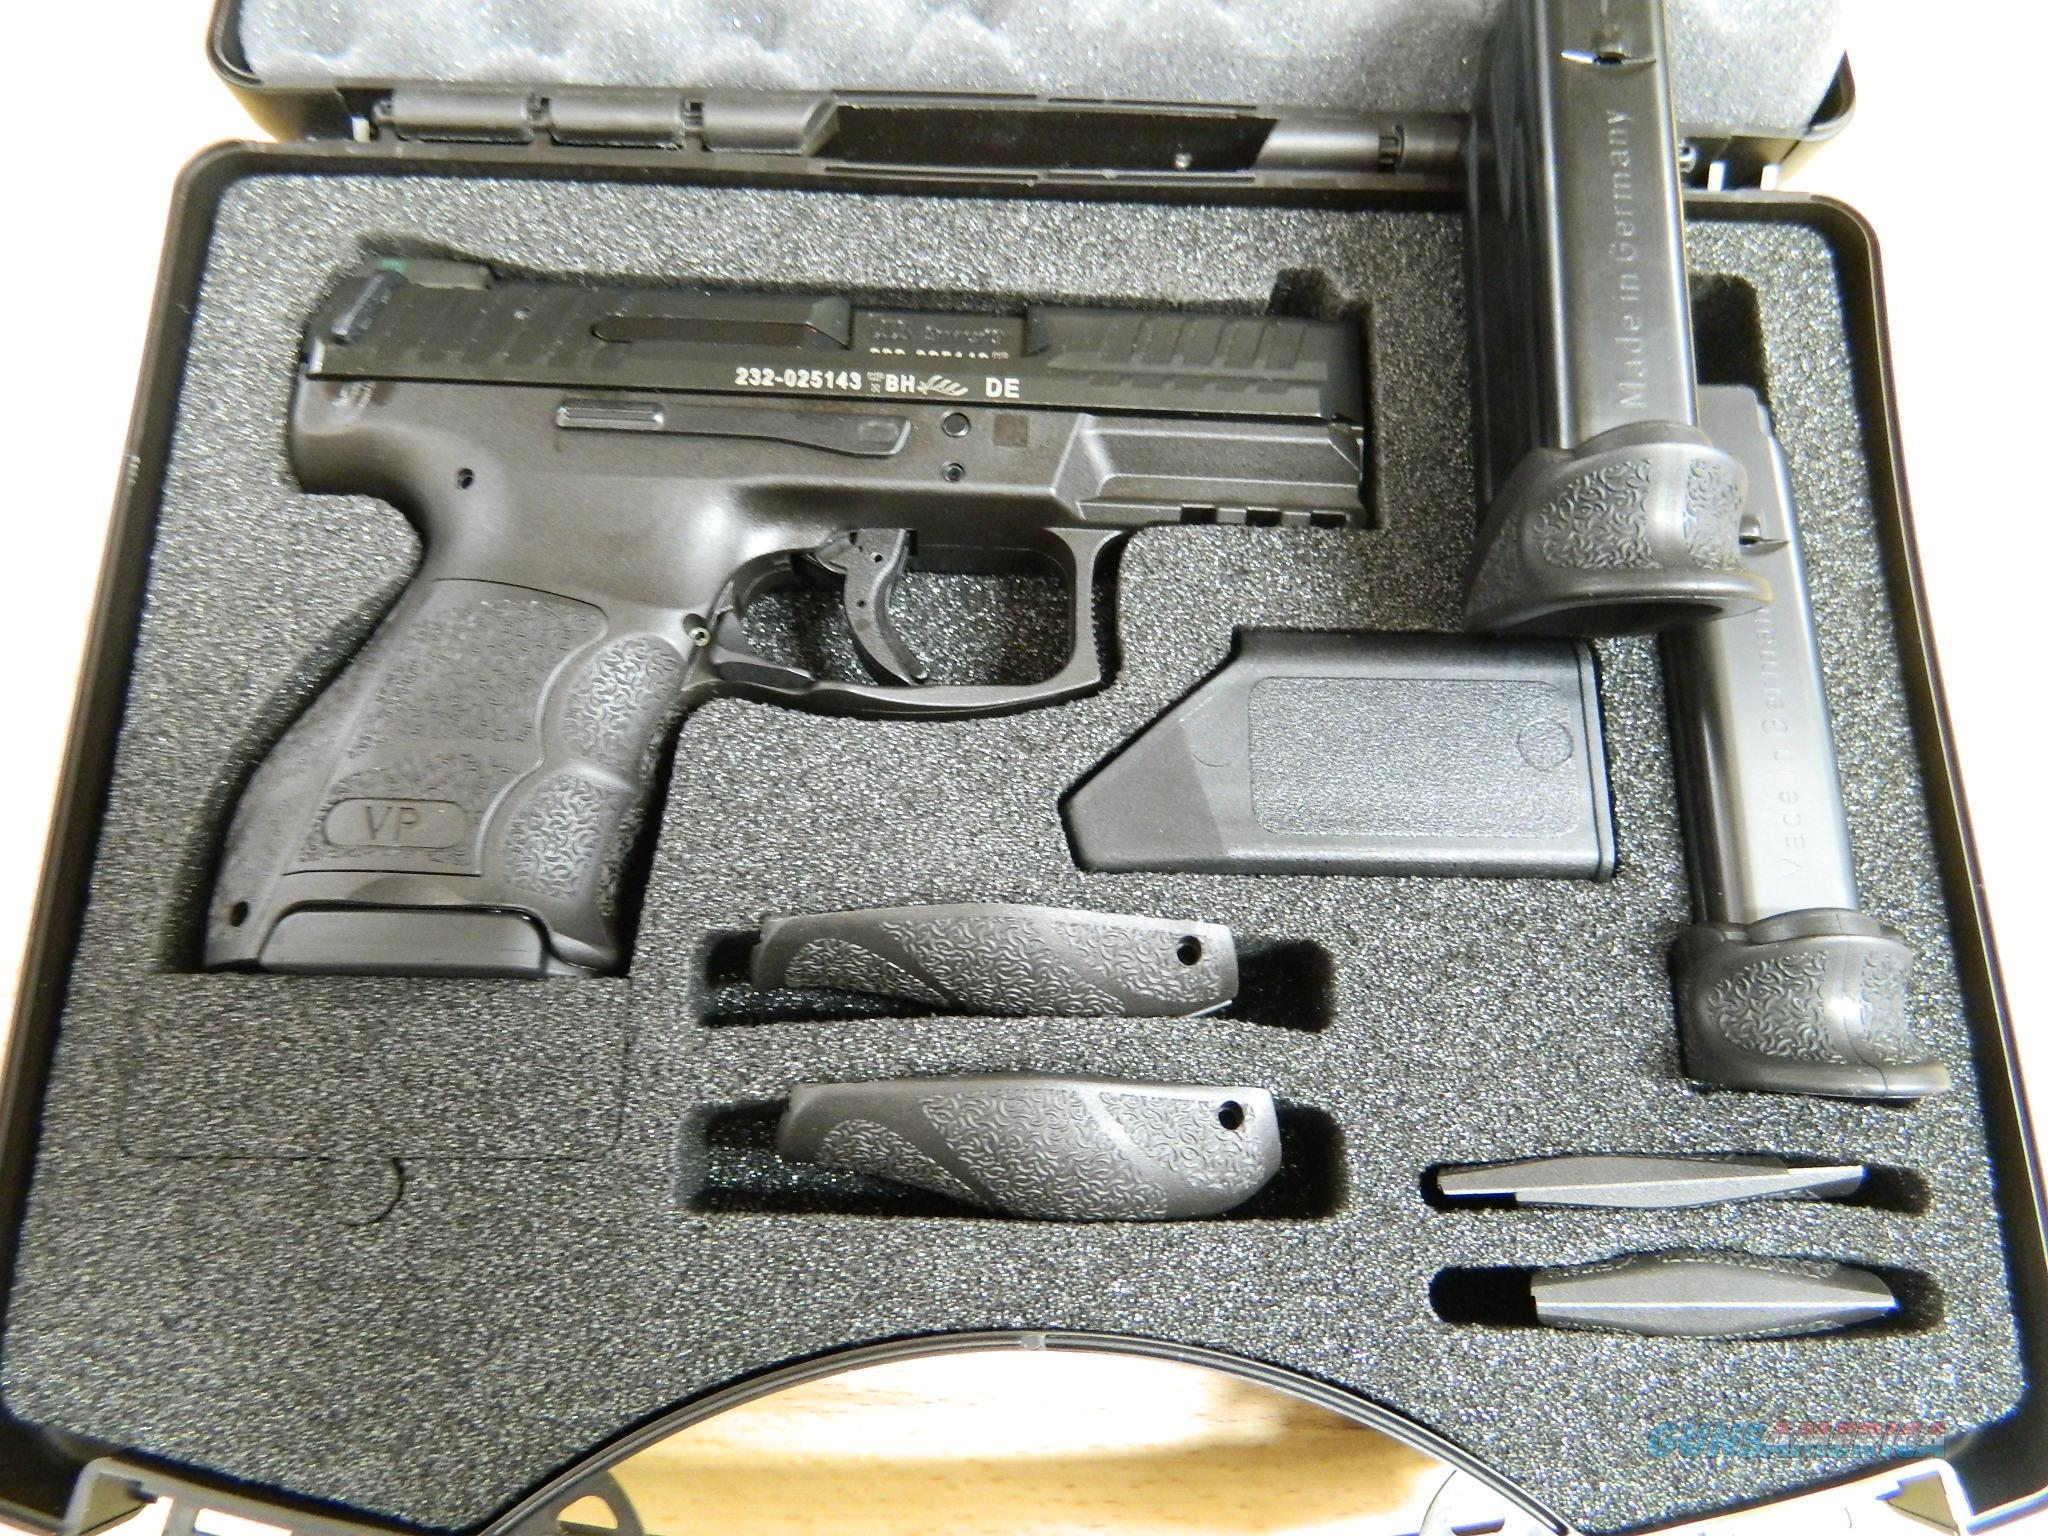 H&K VP9SK LE 9mm New in the Box